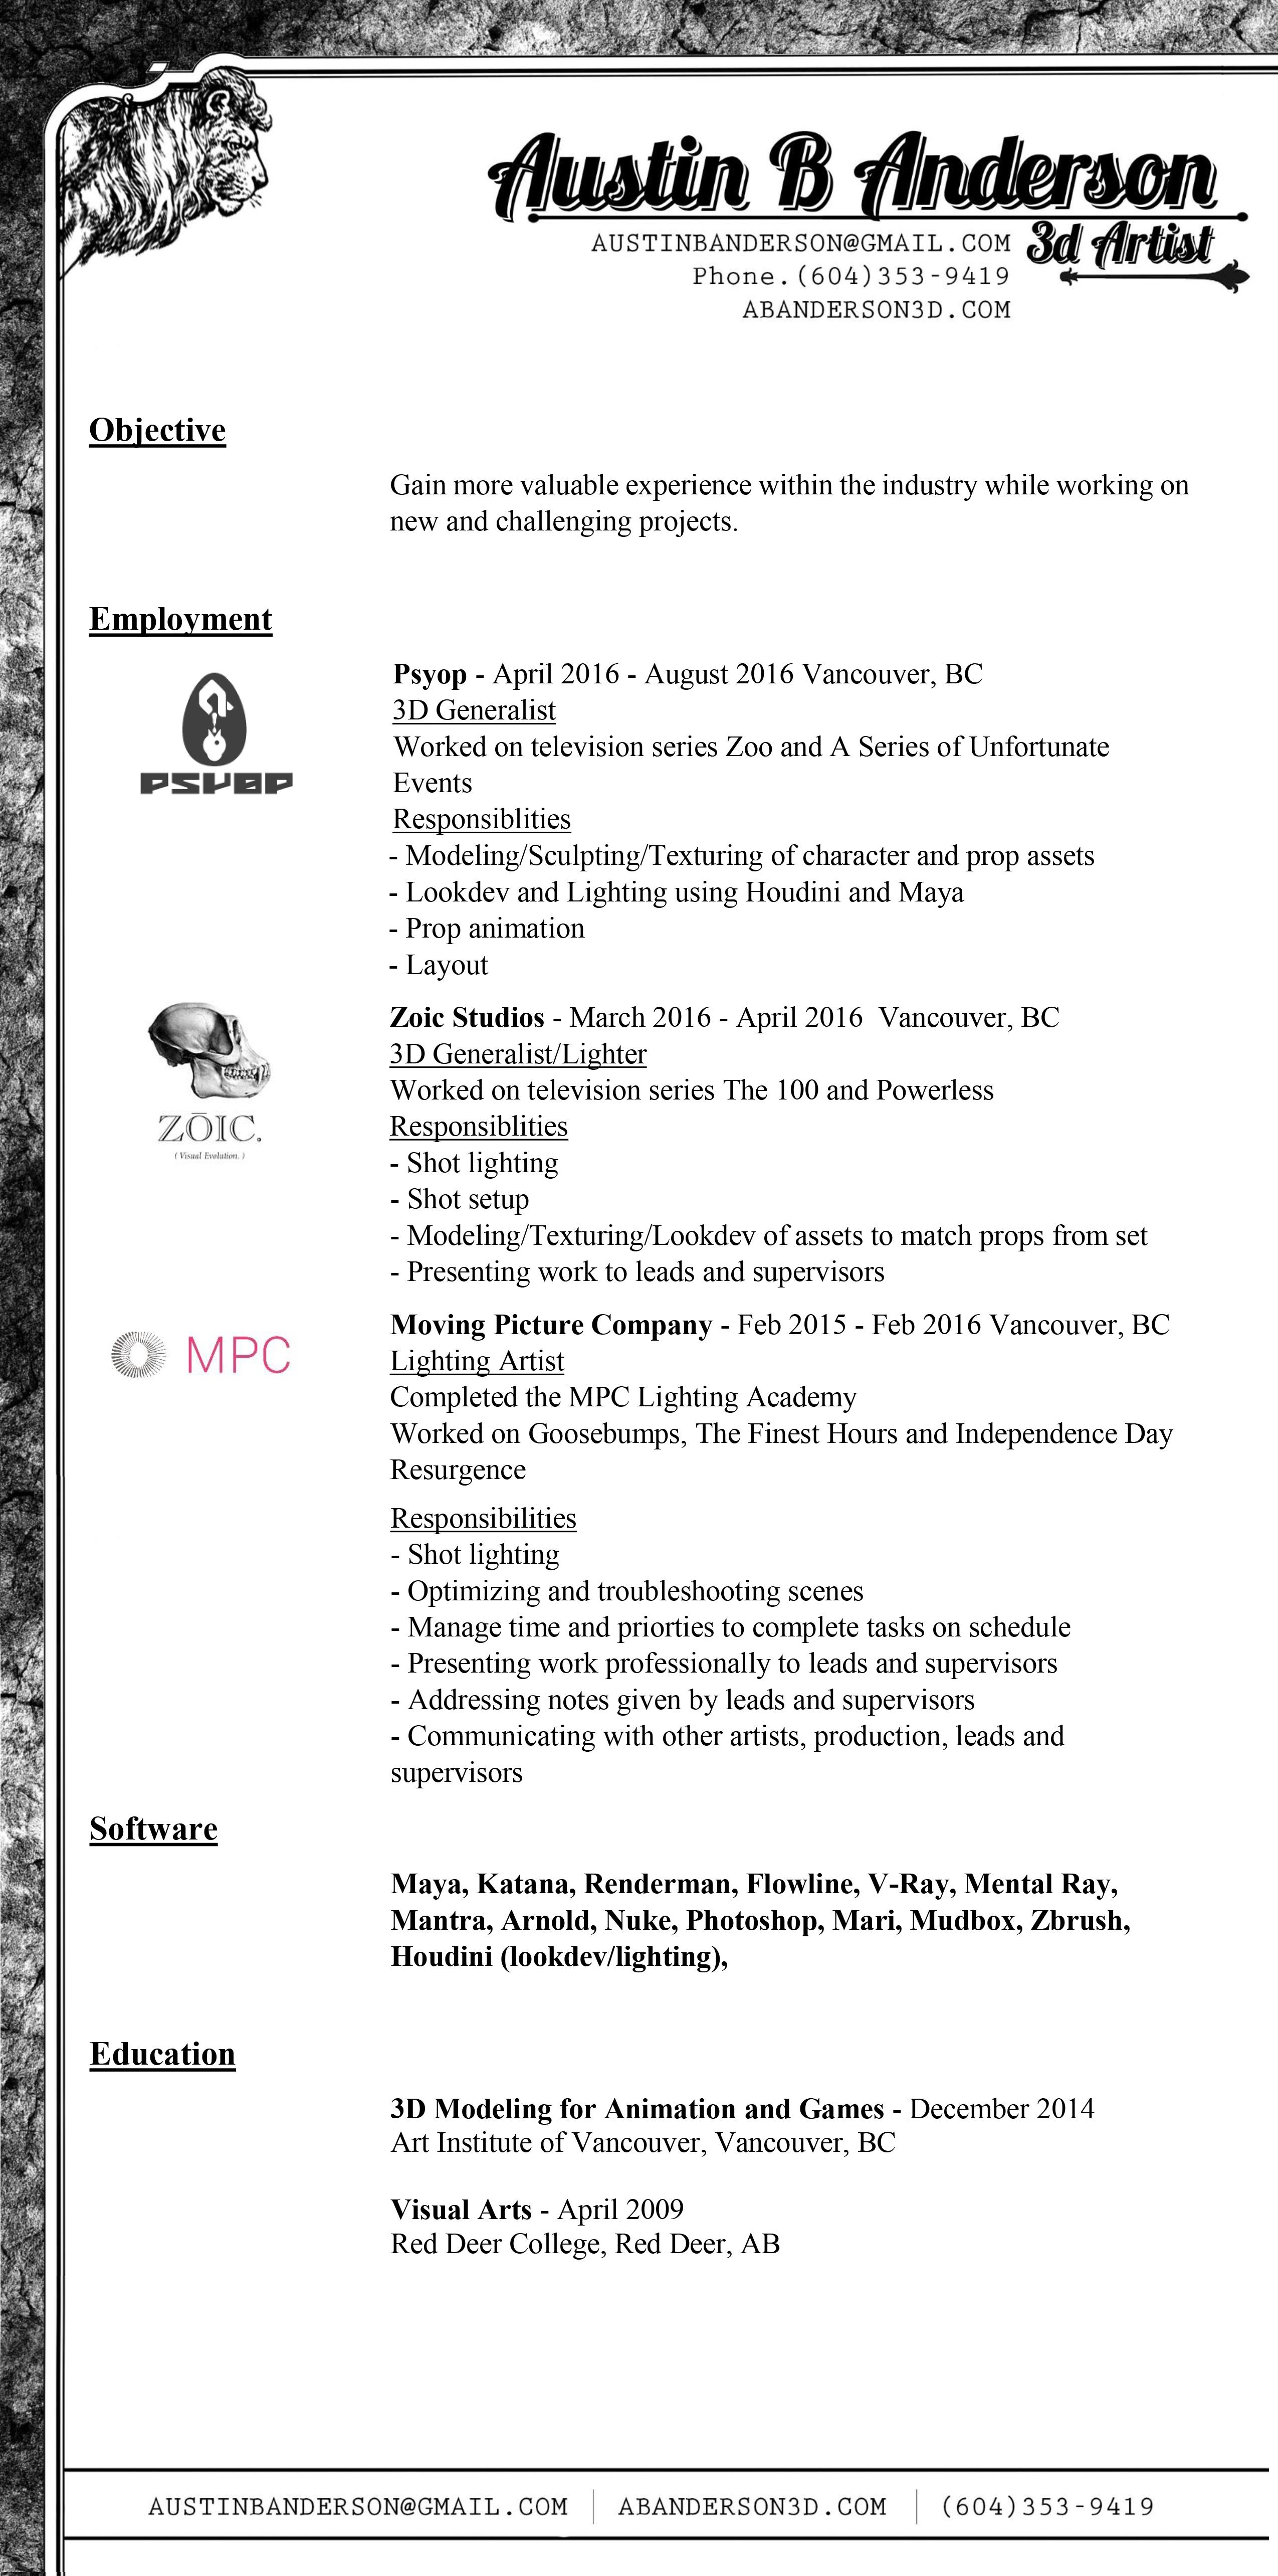 harry gundersen lighting compositing vfx engineer sample resume